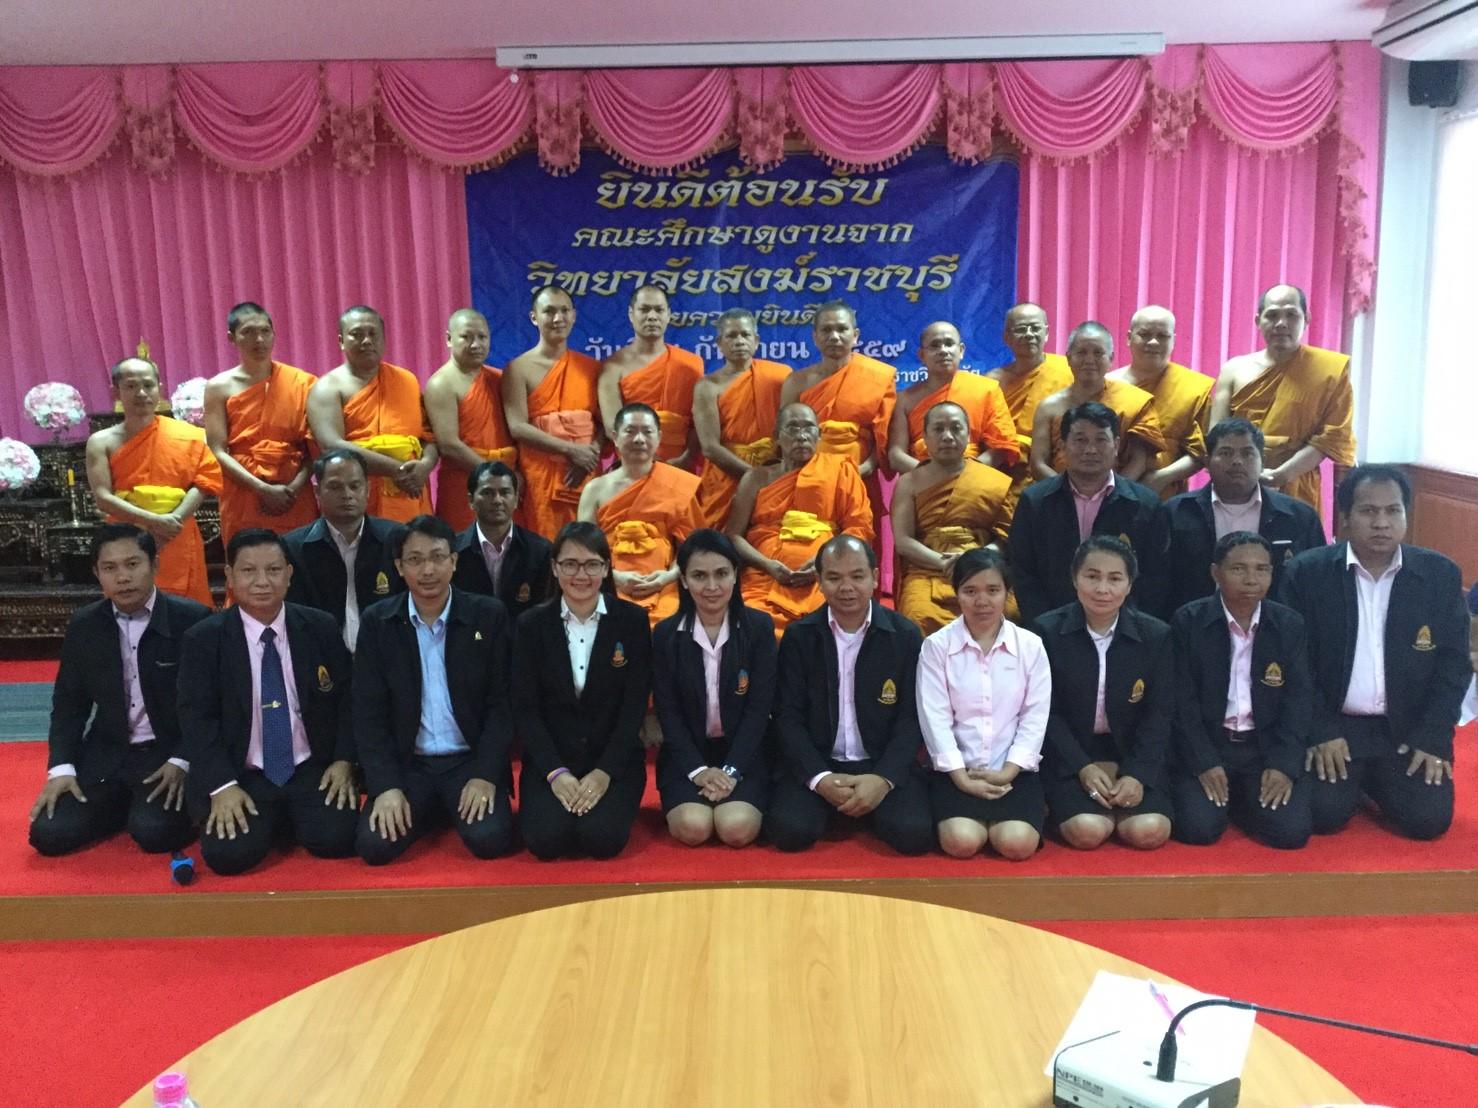 Photo of วิทยาลัยสงฆ์ราชบุรีศึกษาดูงานที่วิทยาลัยสงฆ์ศรีสะเกษ